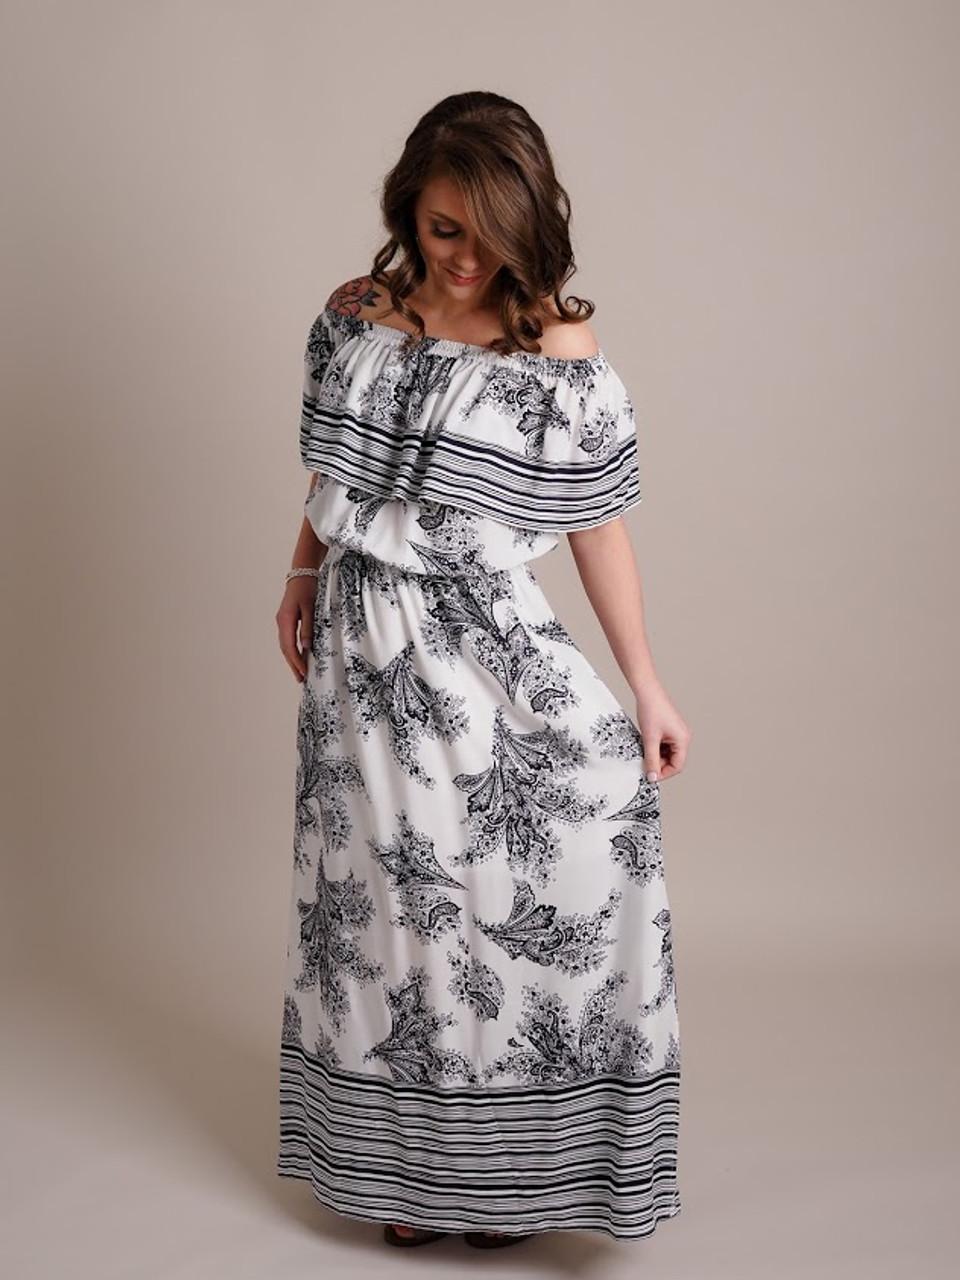 Woman Models Black and White Print Maxi Dress